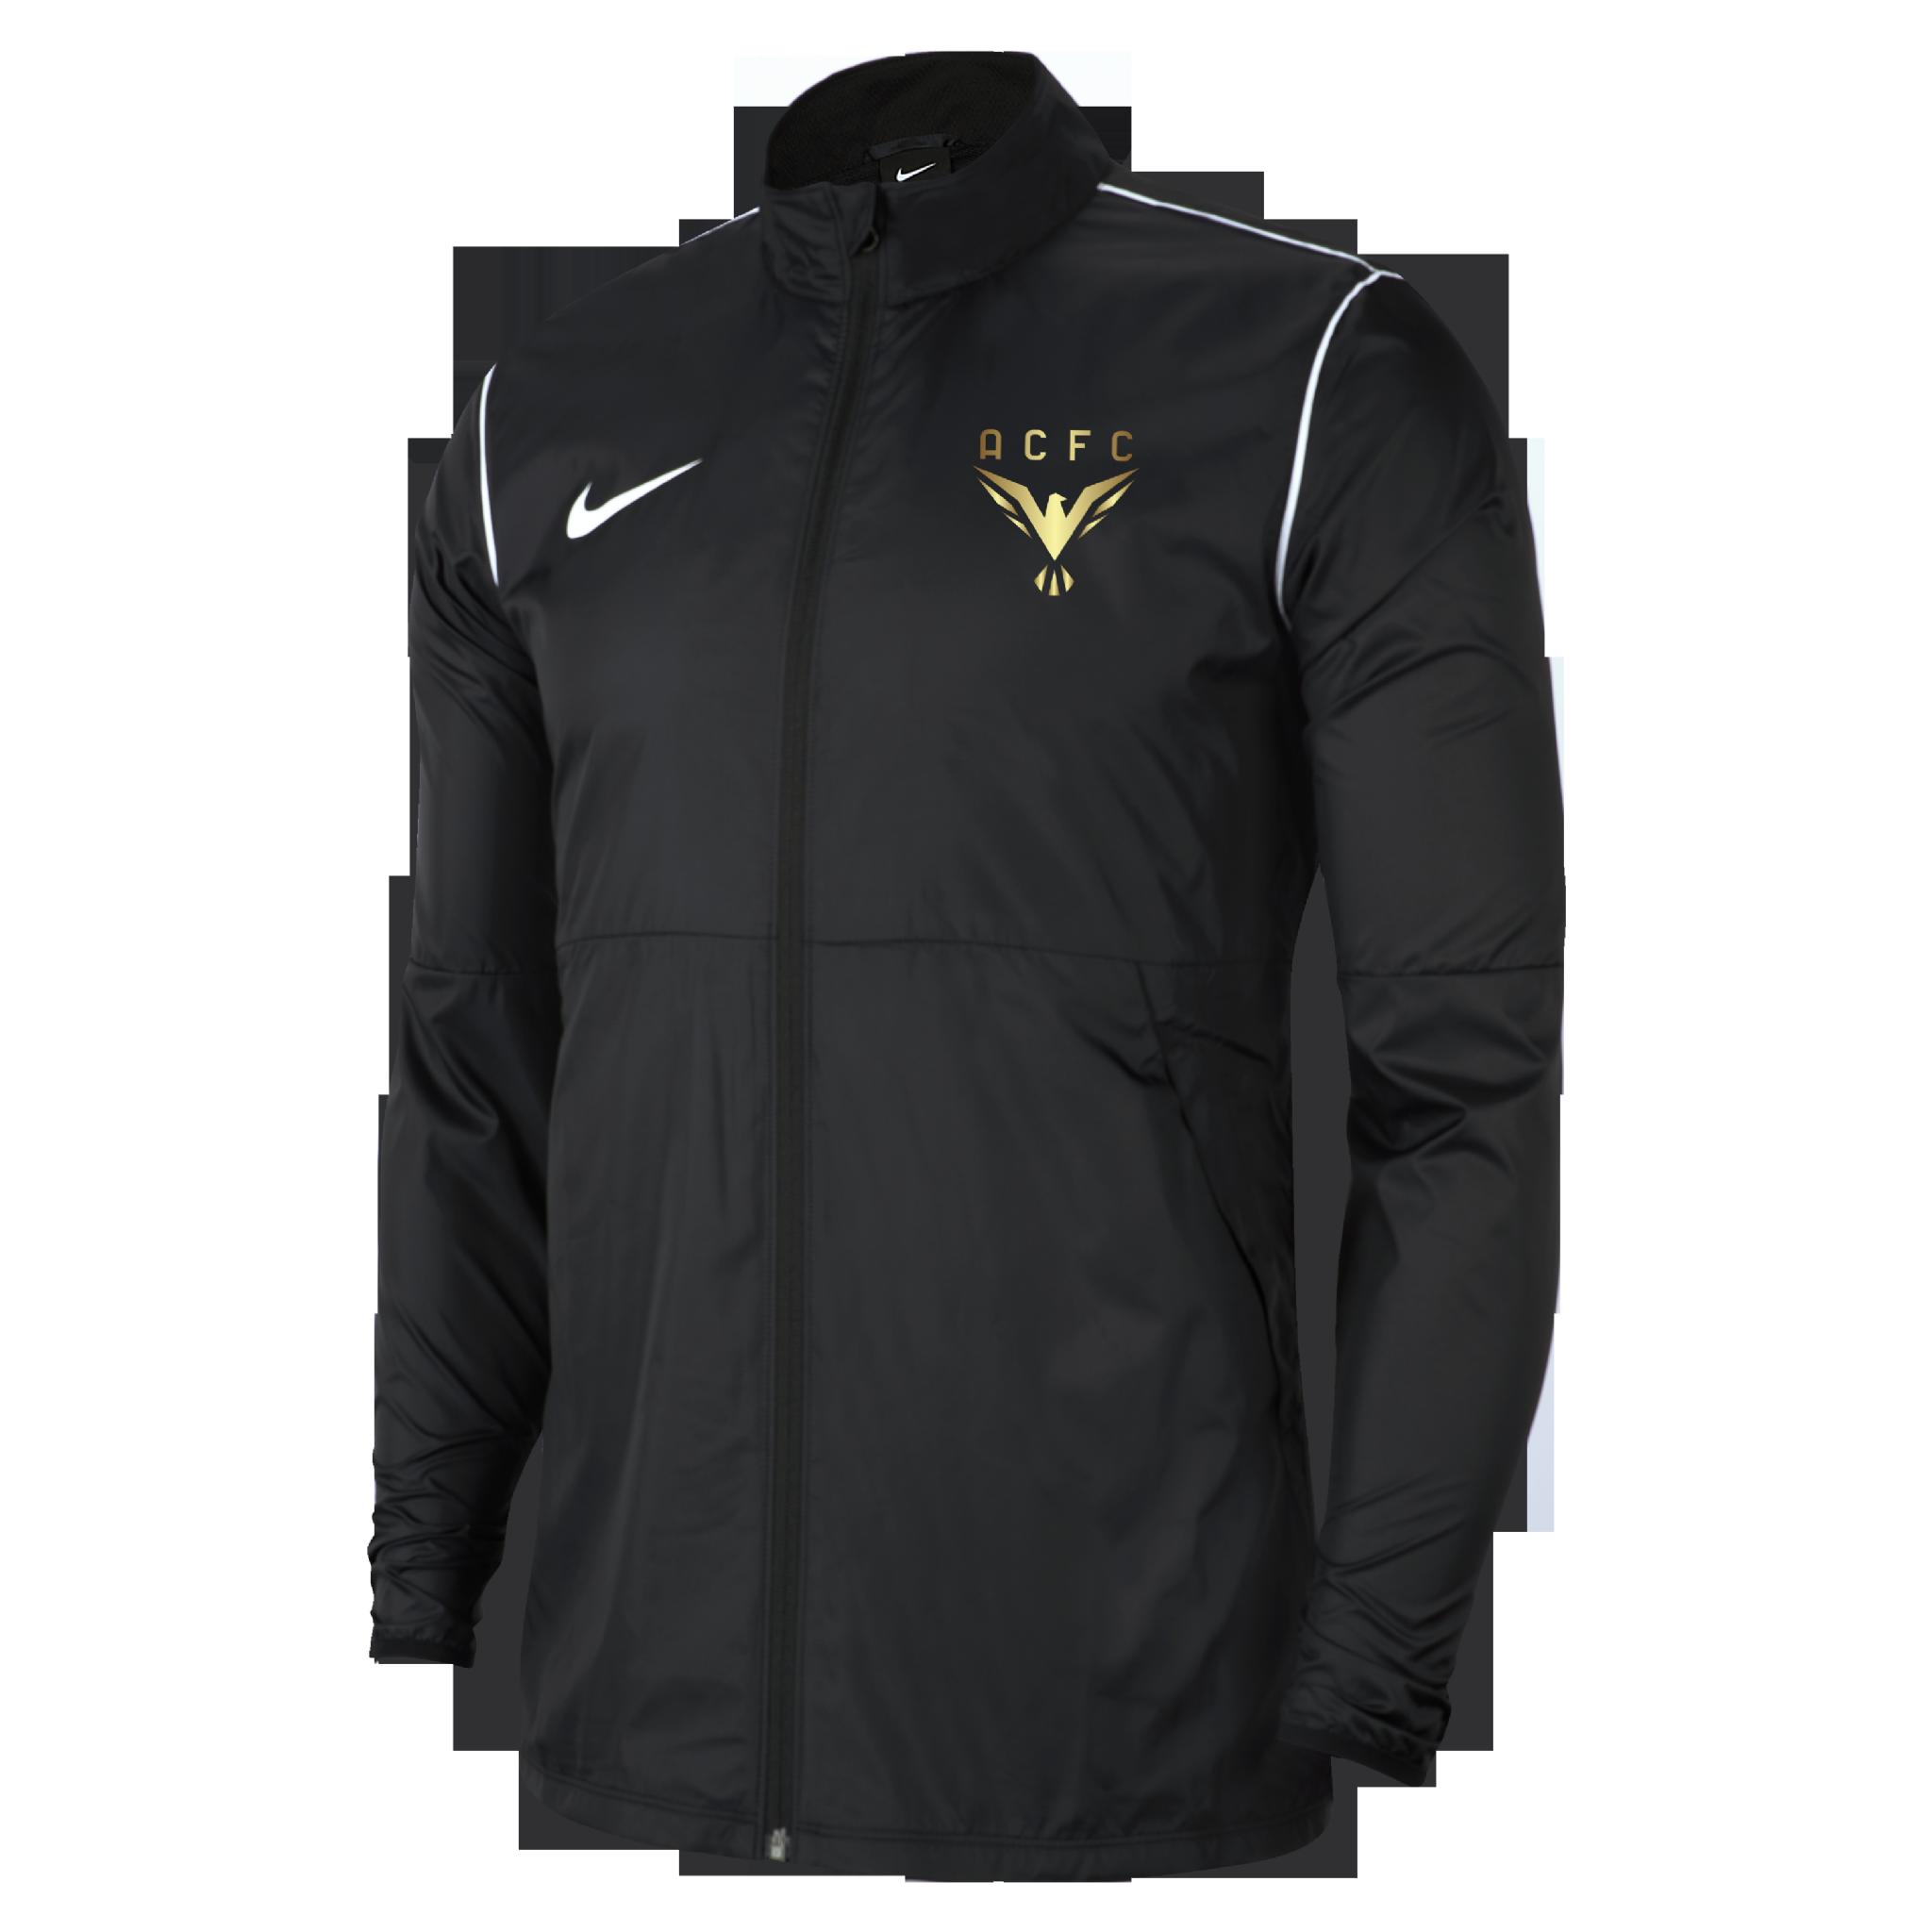 acfc park 20 rain jacket 37713 p